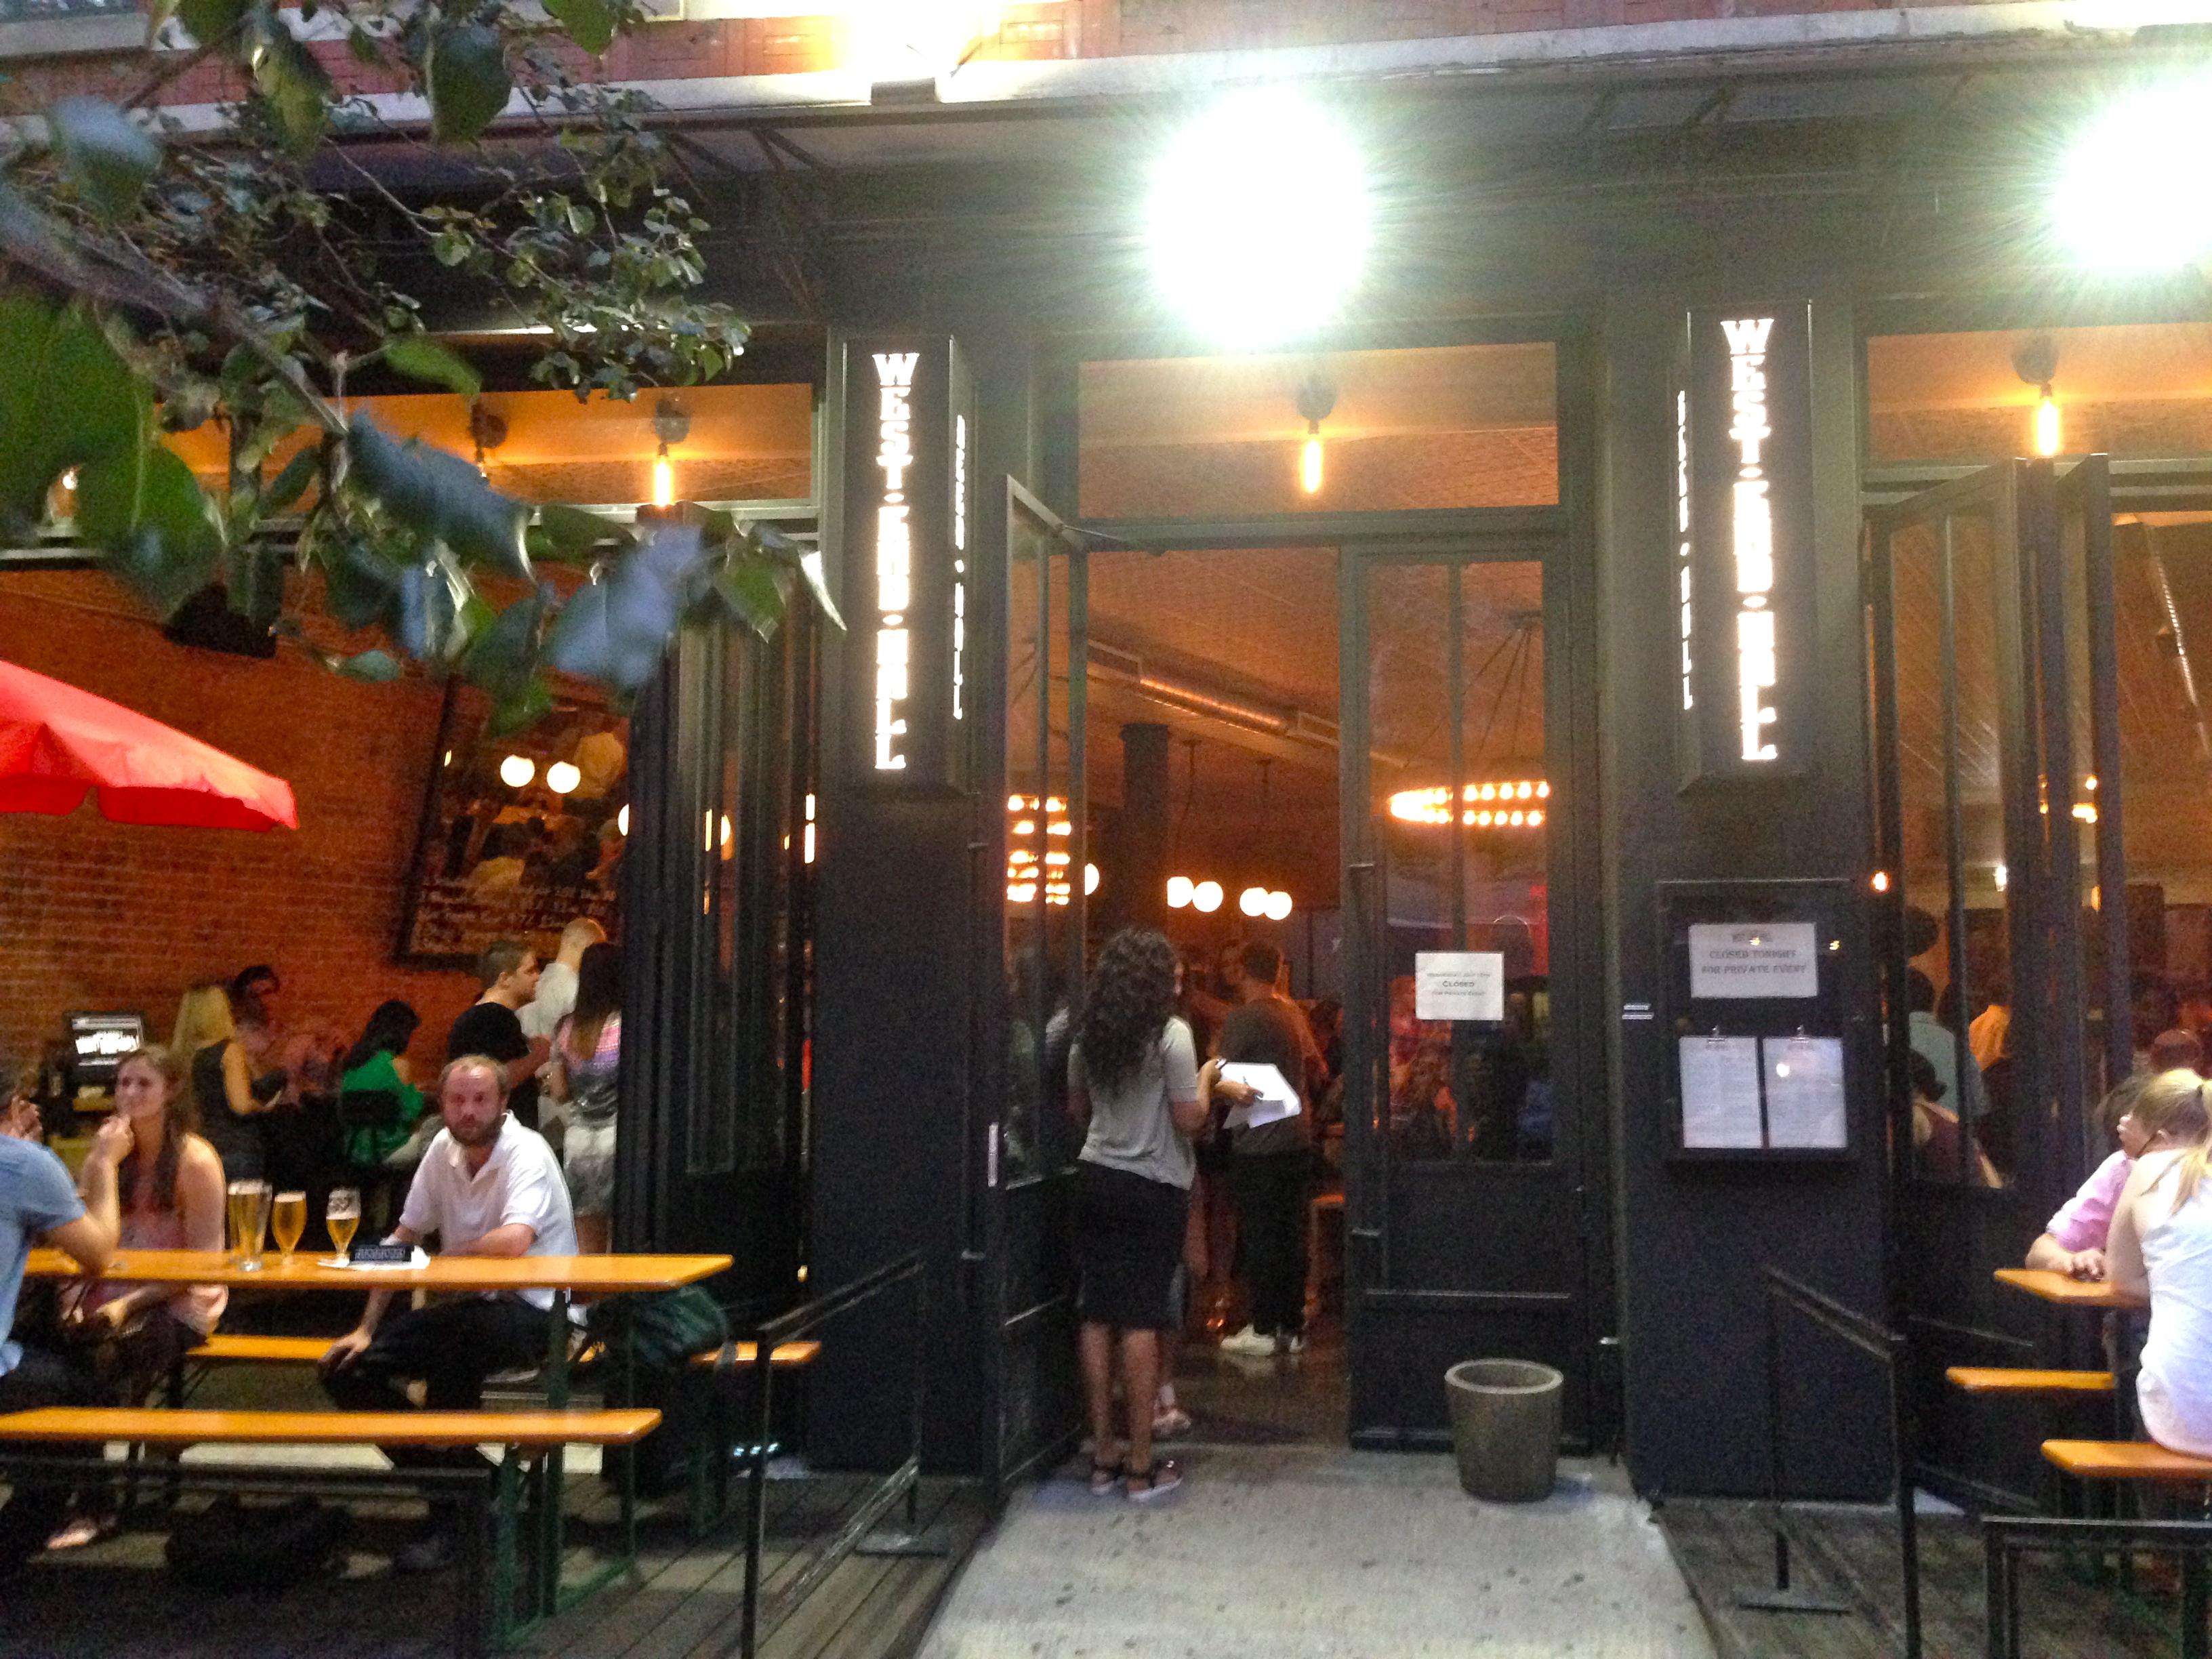 Upper West Side Beer Garden Alert! – Mary in Manhattan